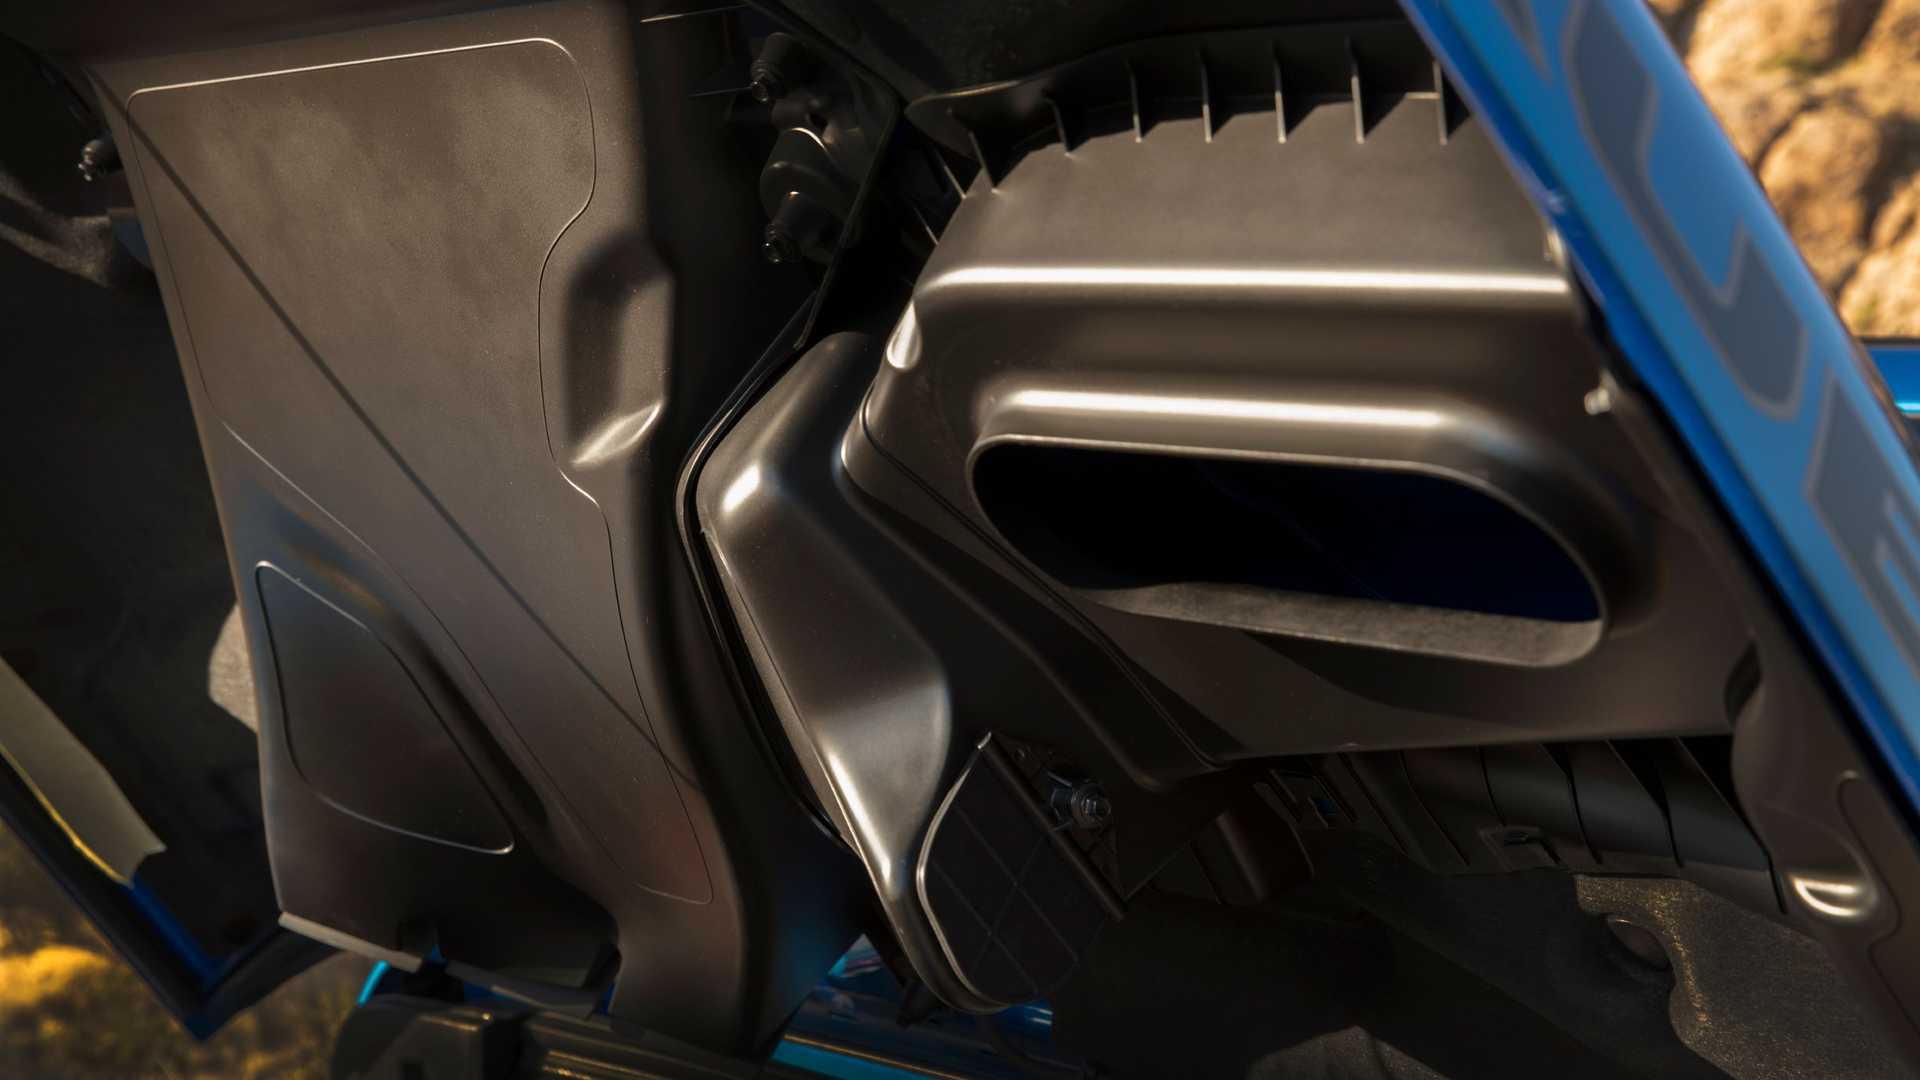 2021-jeep-wrangler-rubicon-392-hydro-guide-intake-1